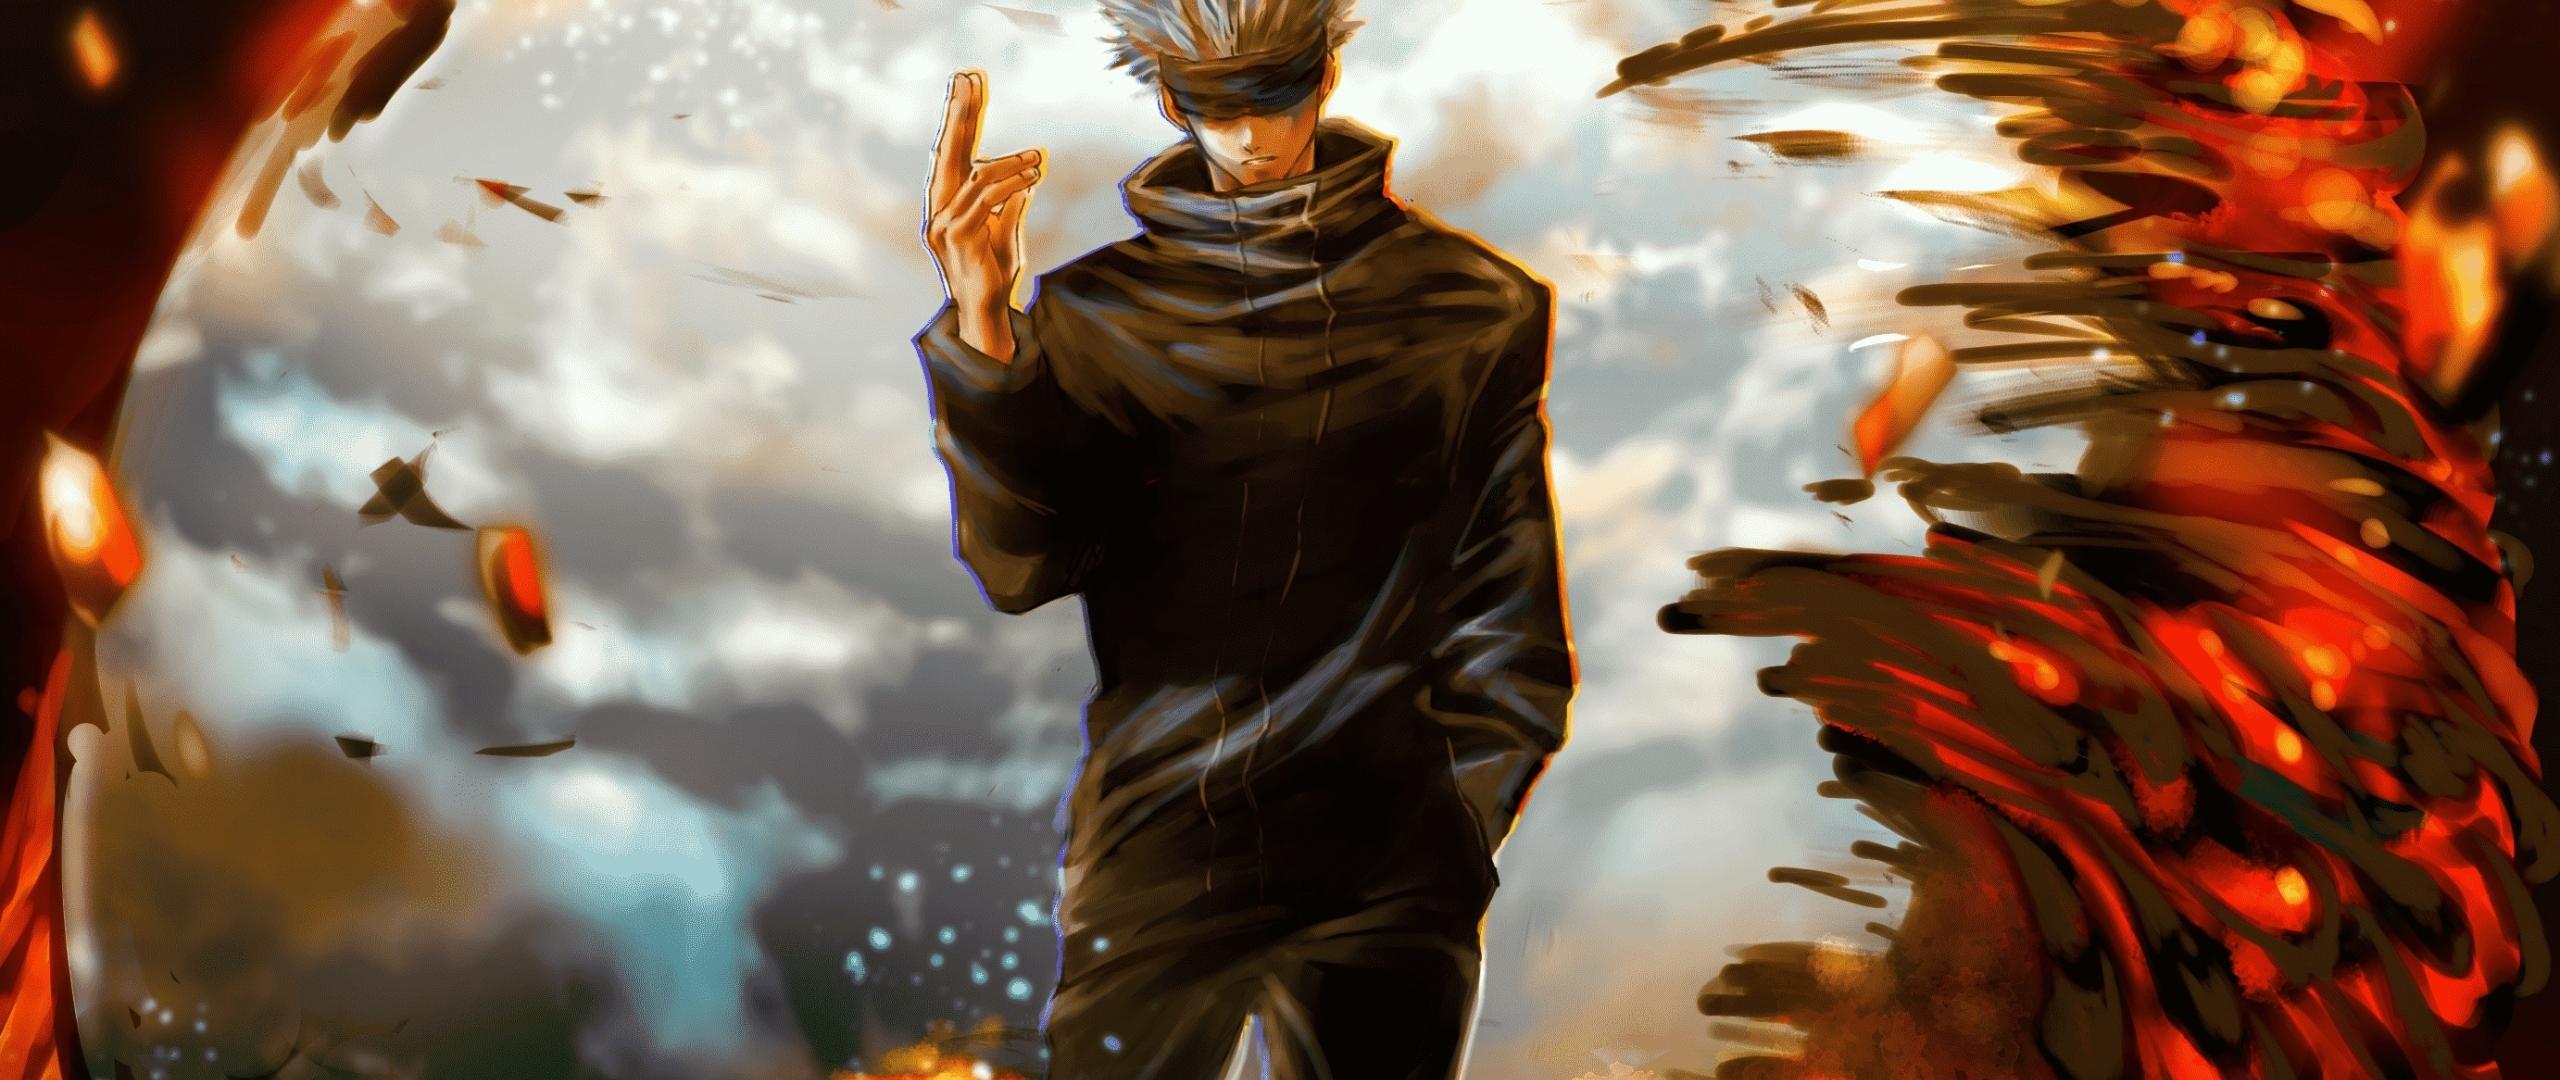 2560x1080 Satoru Gojo Jujutsu Kaisen 2560x1080 Resolution Wallpaper Hd Anime 4k Wallpapers Images Photos And Background Wallpapers Den